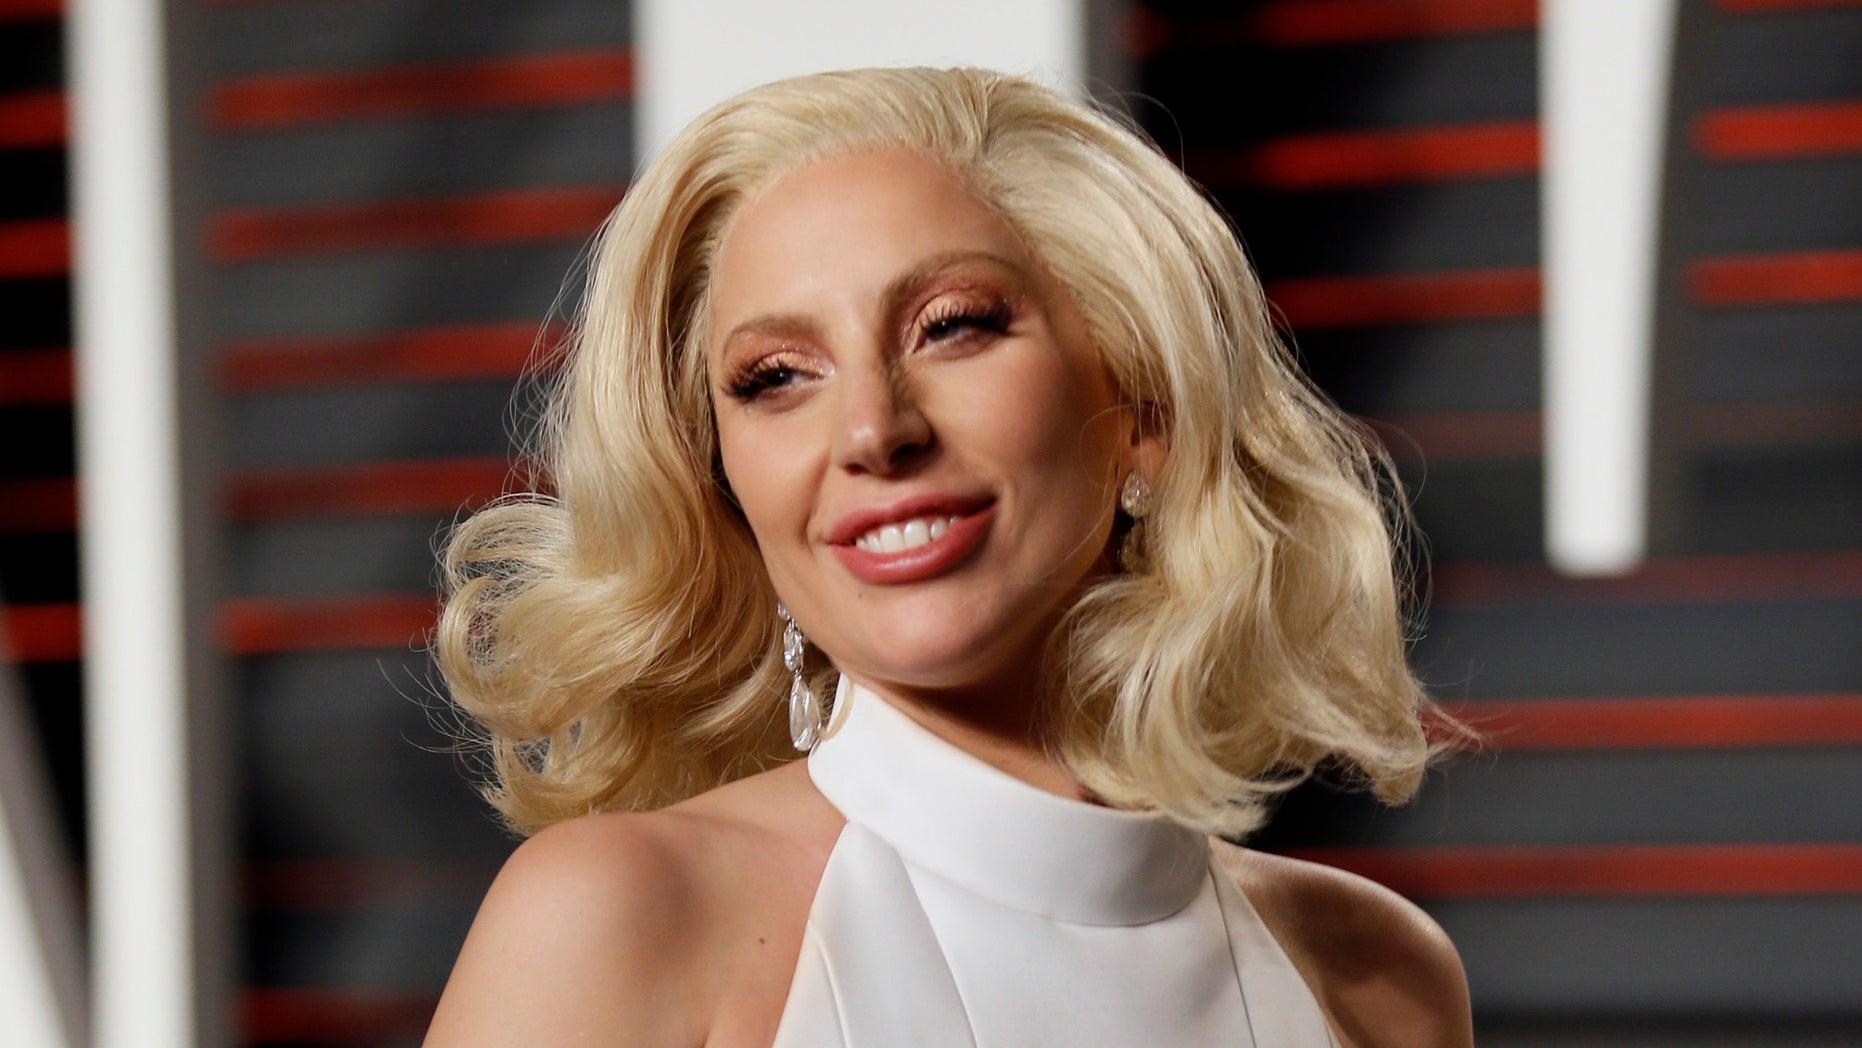 Lady Gaga at the Vanity Fair Oscar party in 2016.